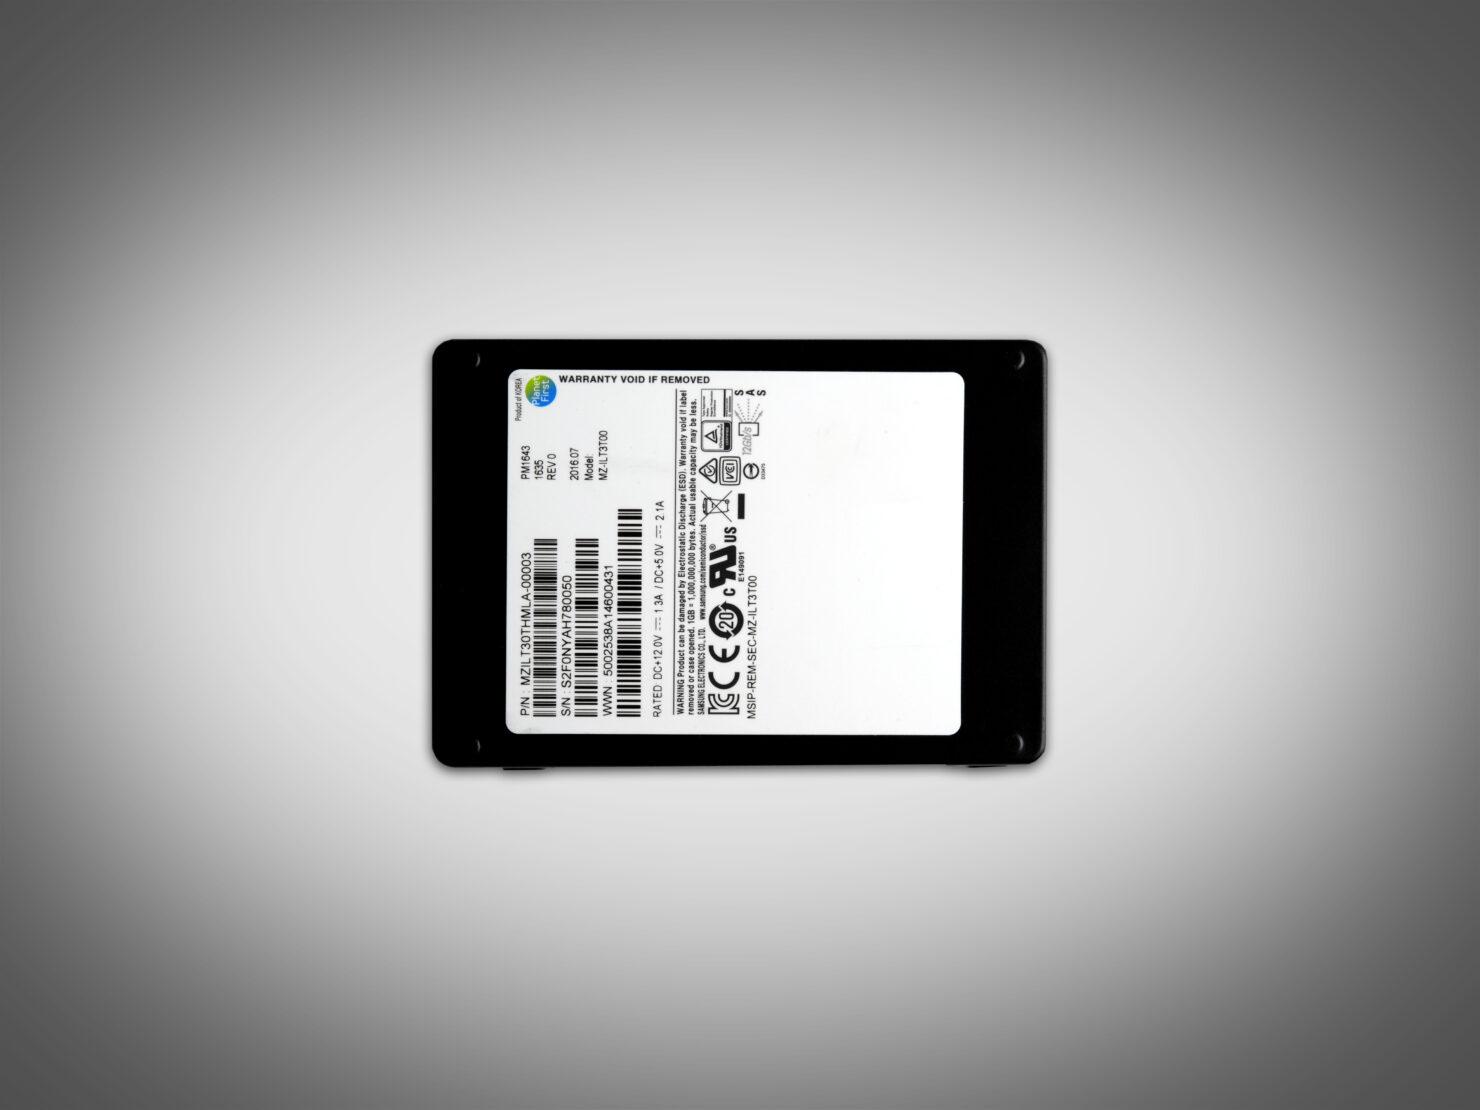 Samsung 32TB SSD 2.5-inch